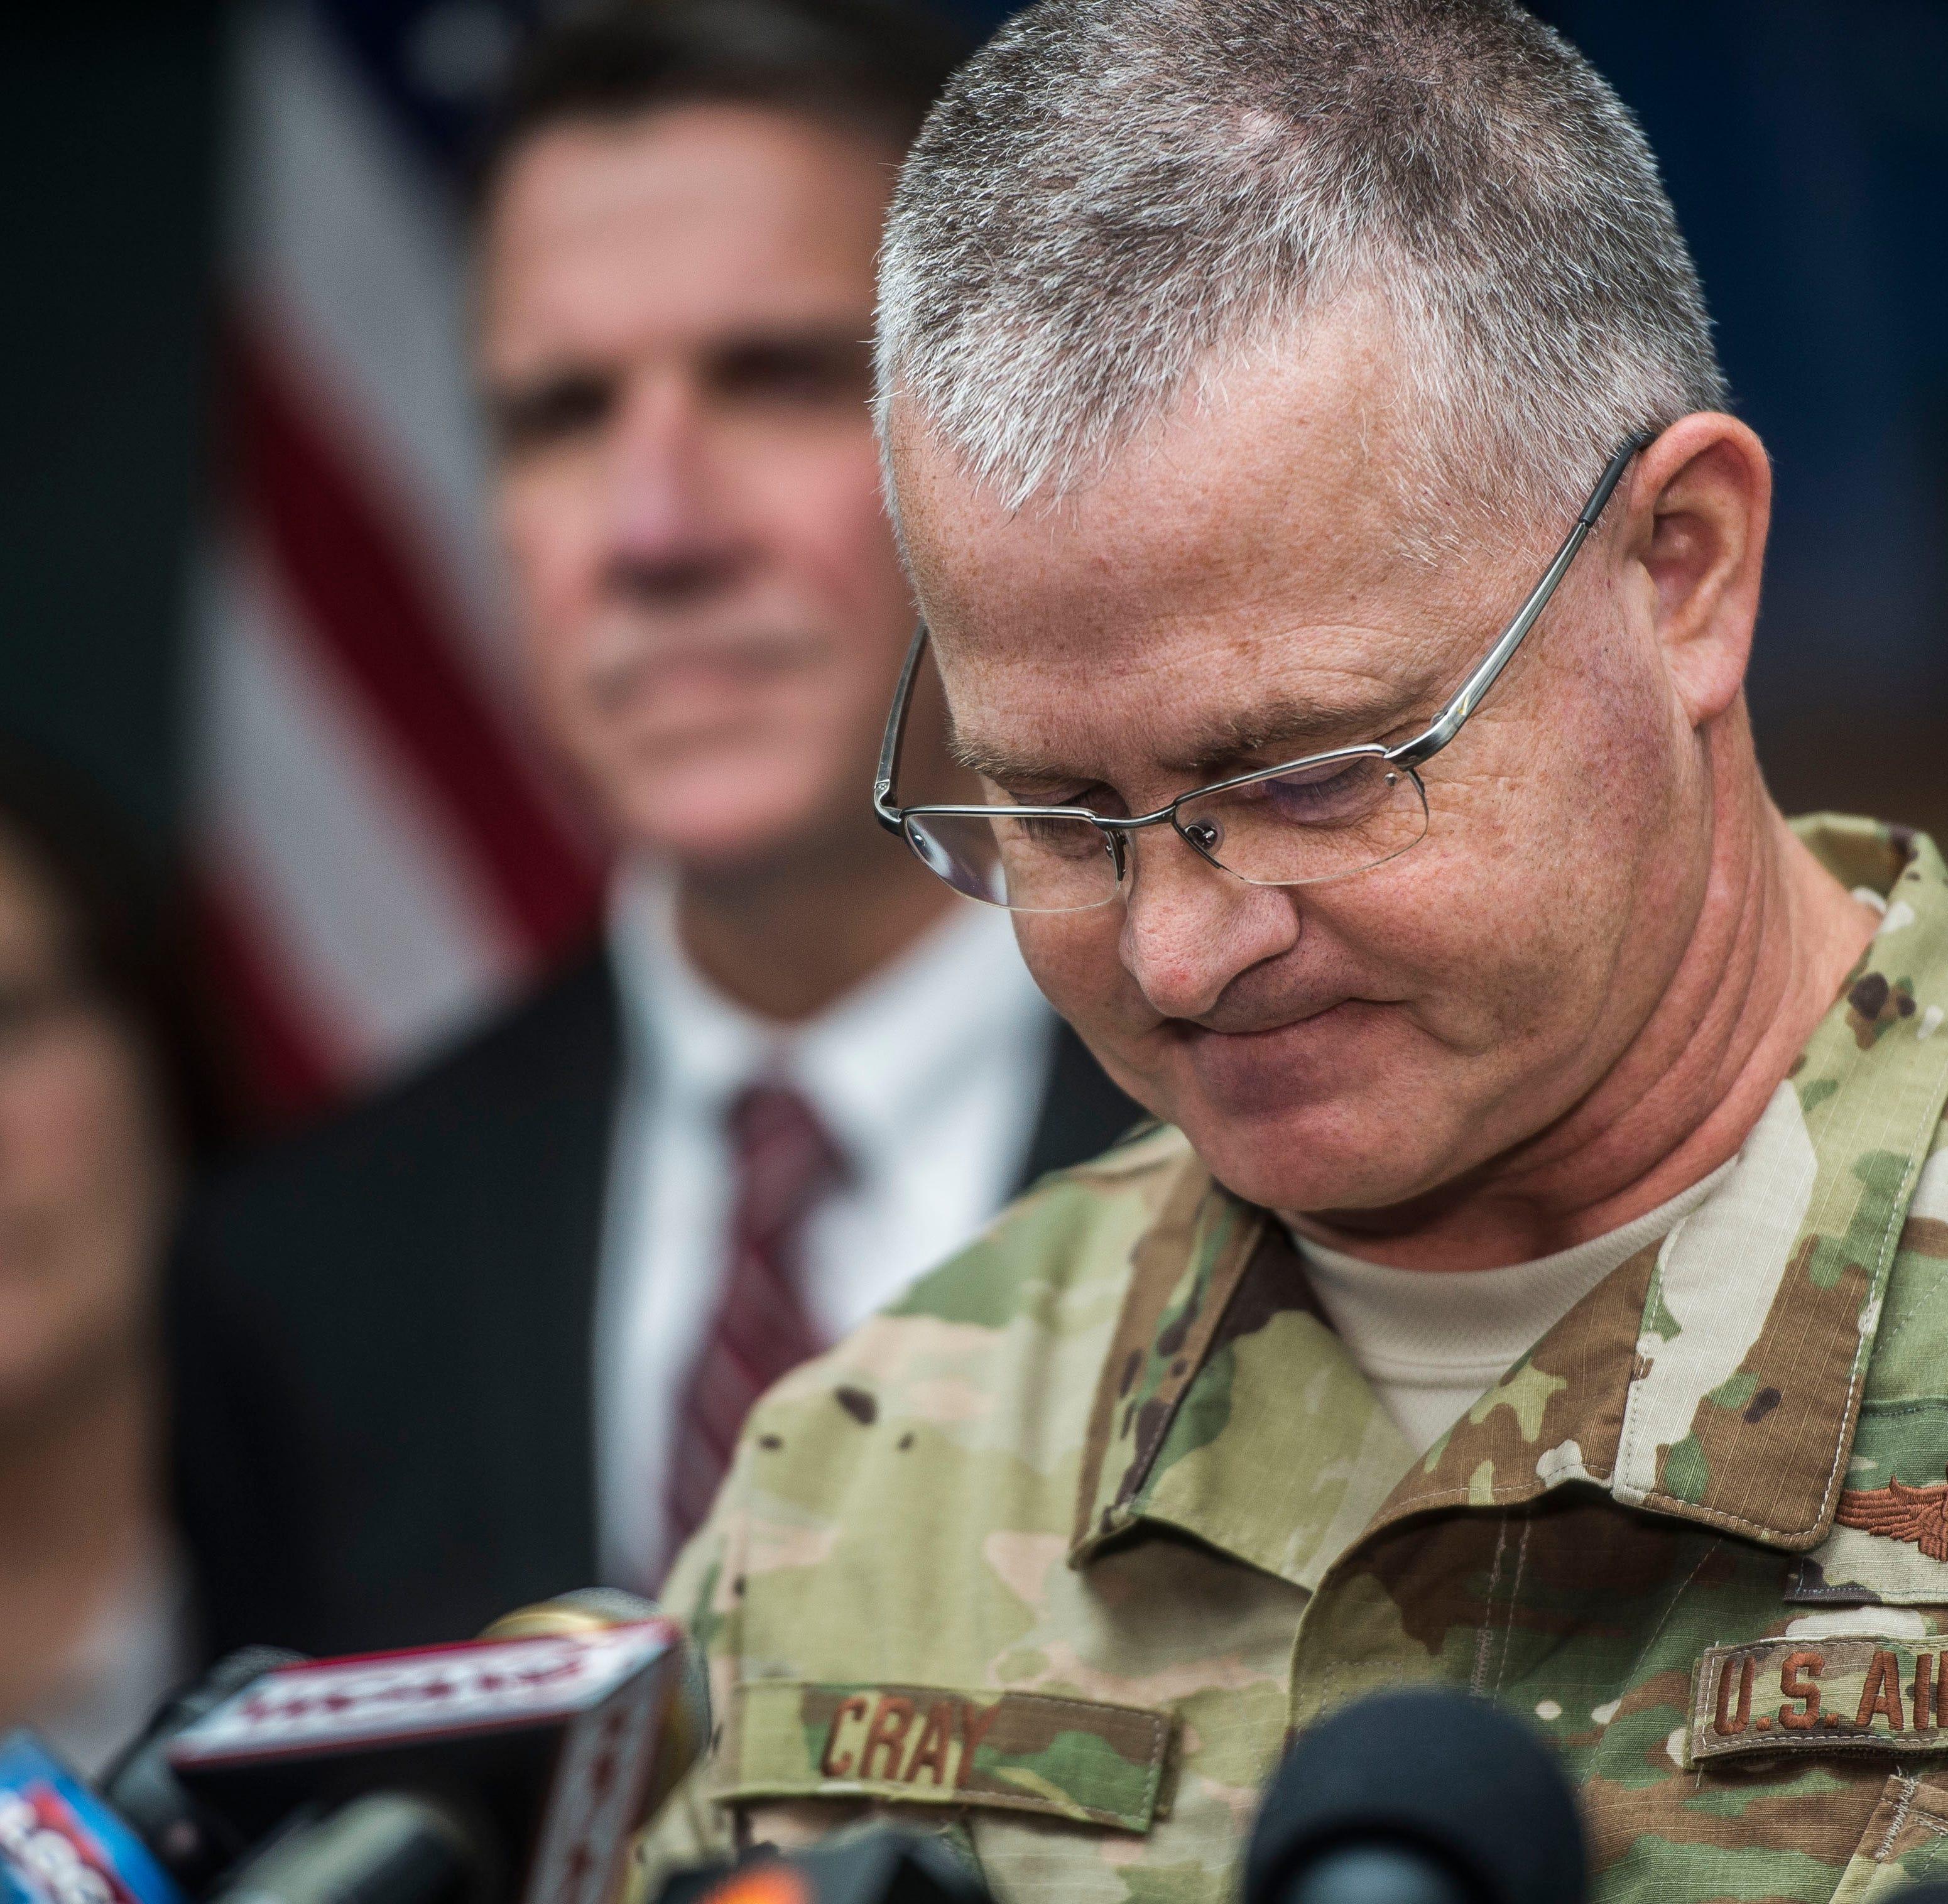 Vermont adjutant general disputes portrayal of Guard 'culture'